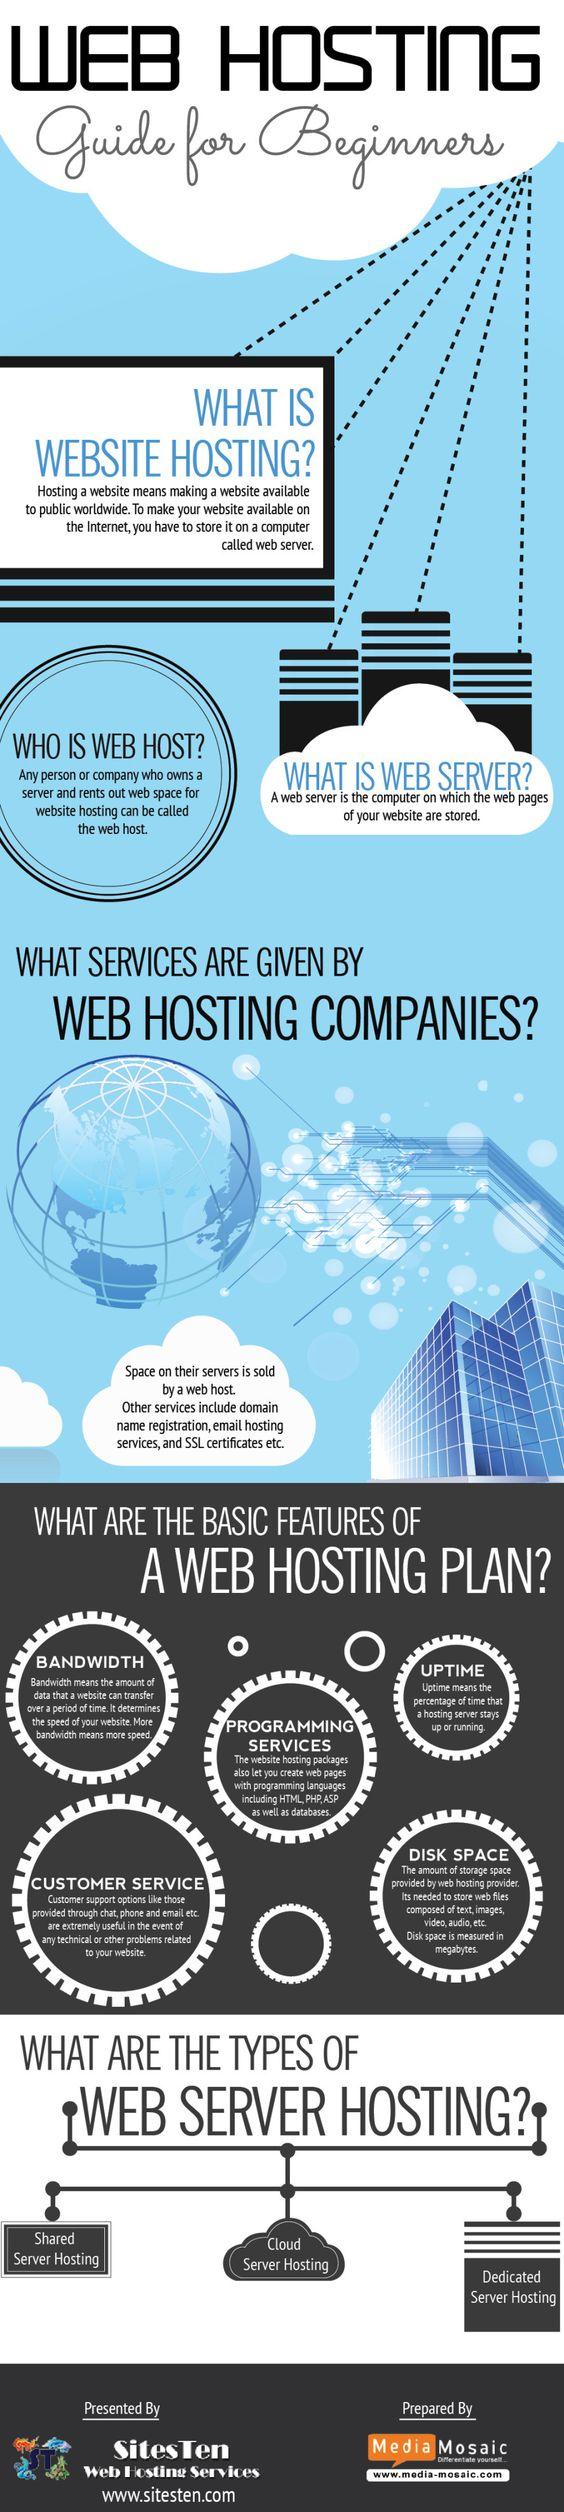 web hosting guide